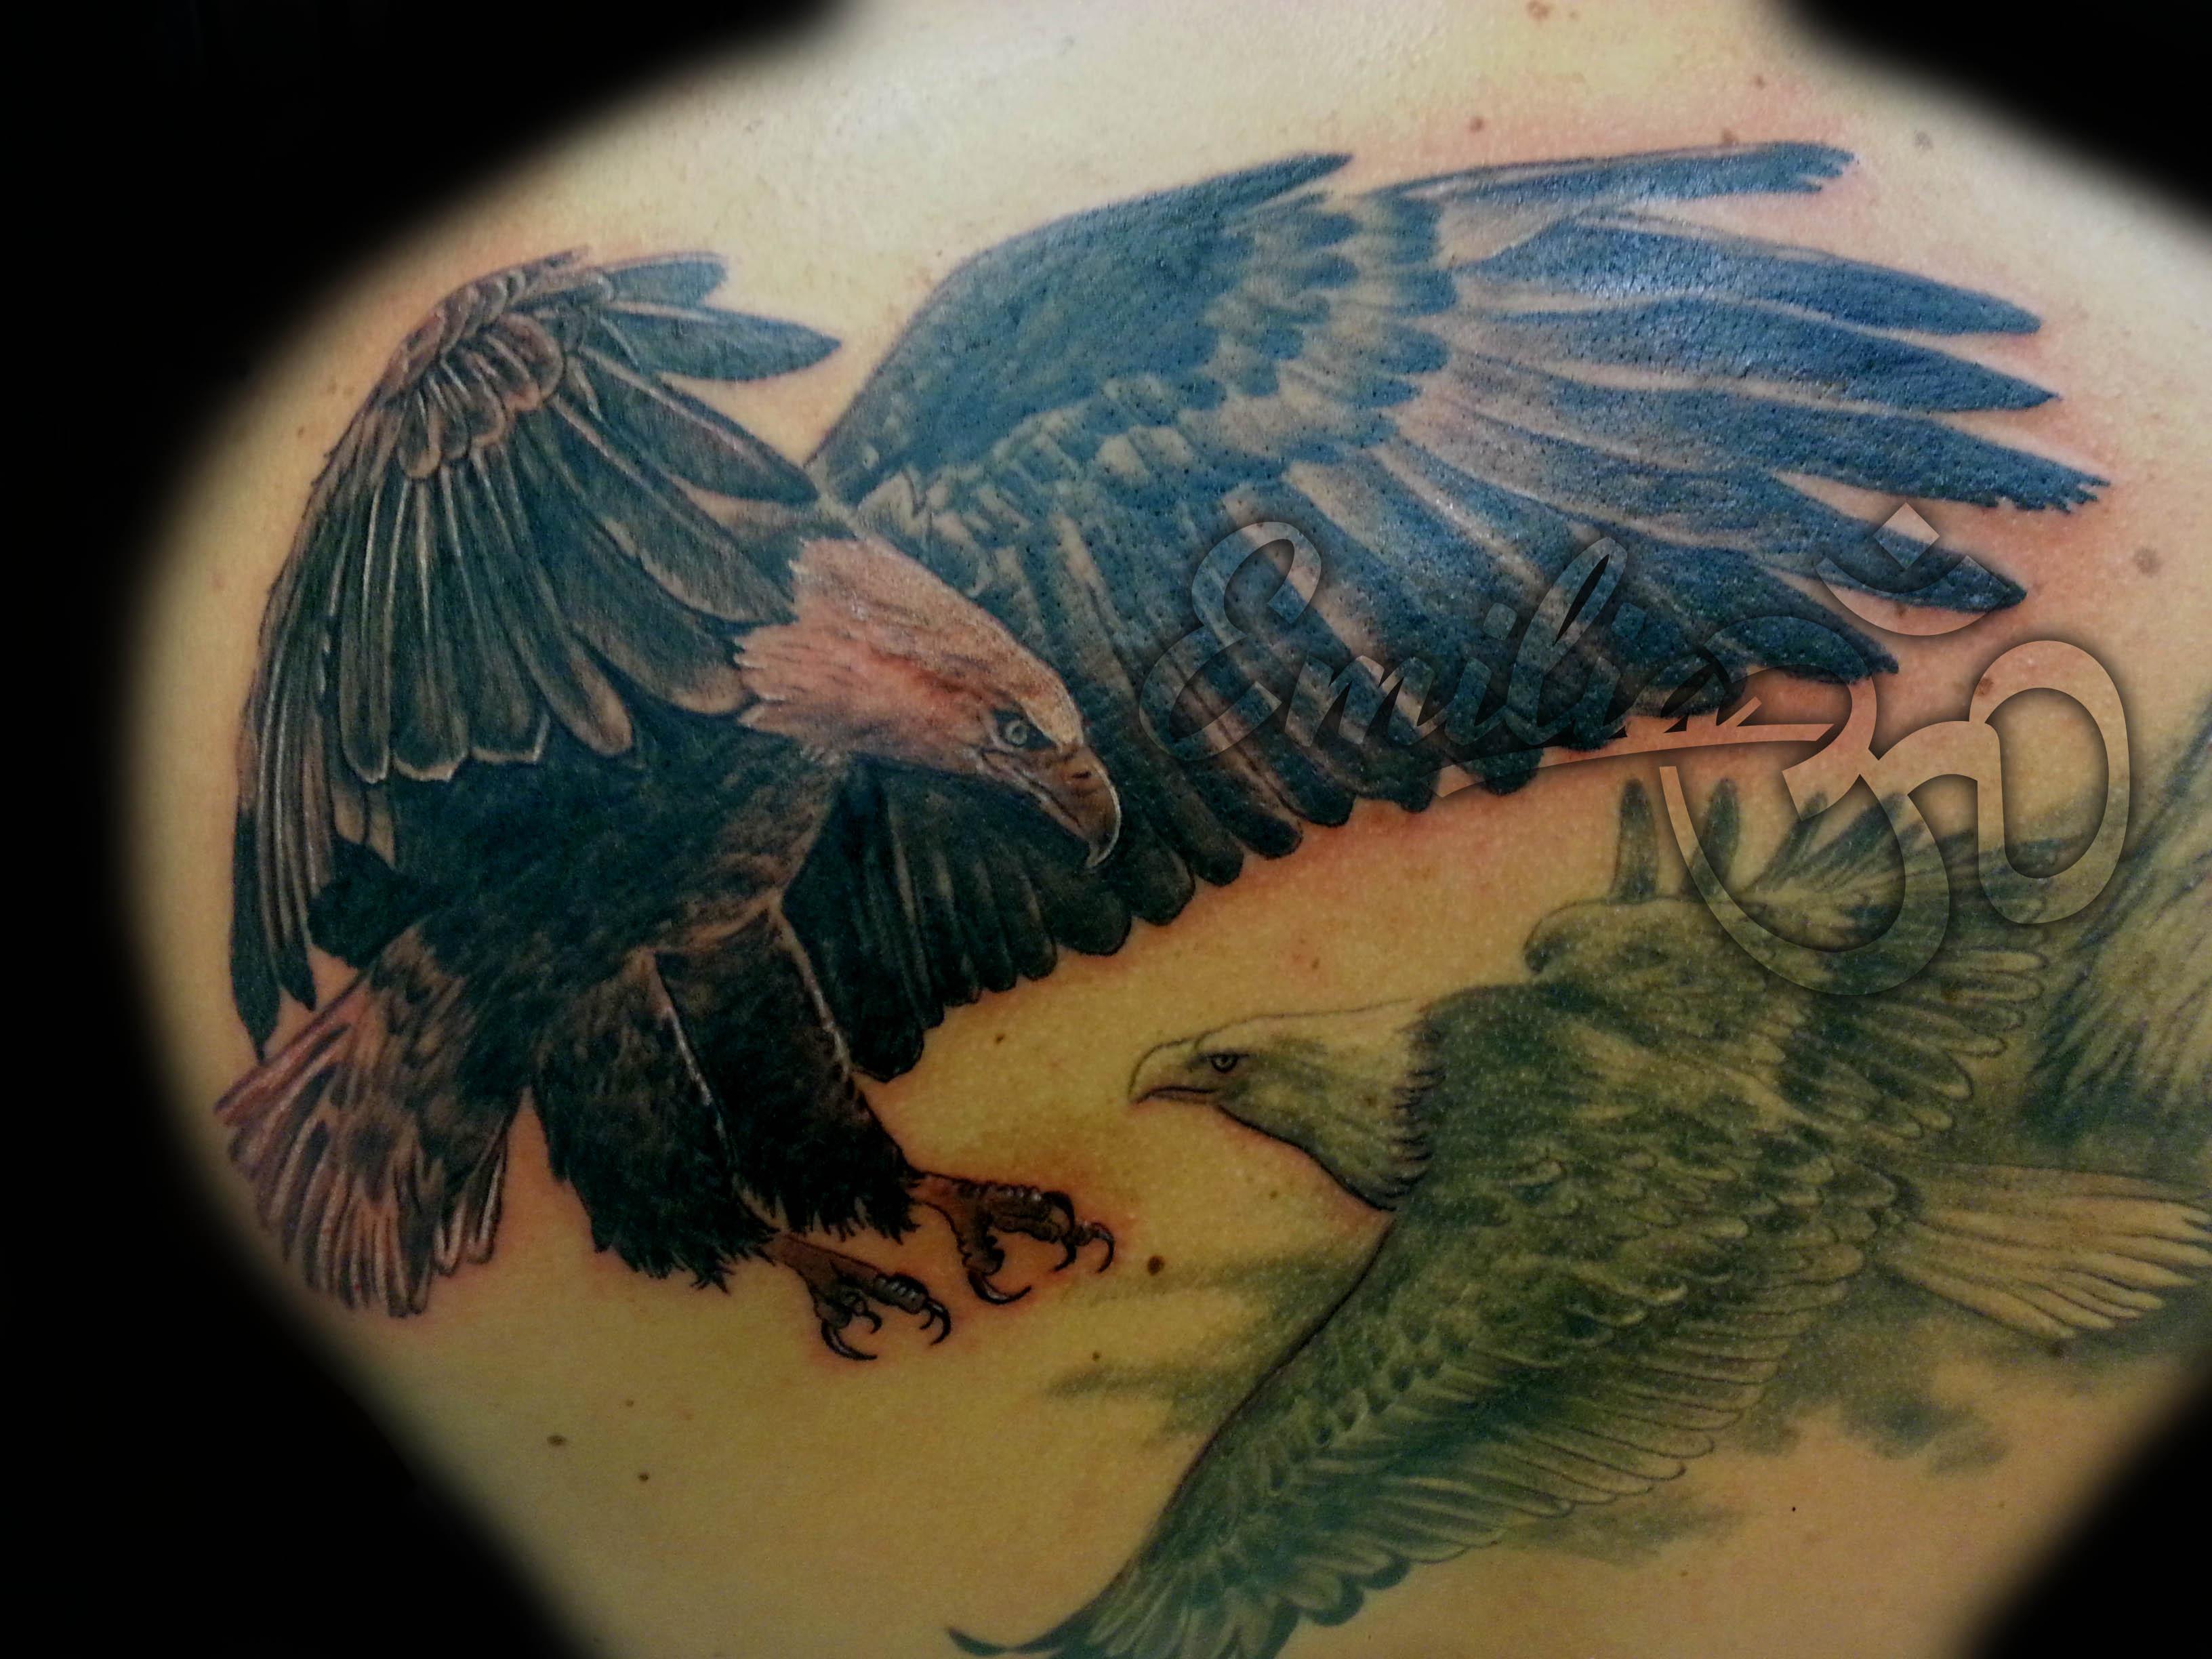 Realistic Black & White Eagle Tattoo - Balinese Tattoo Miami